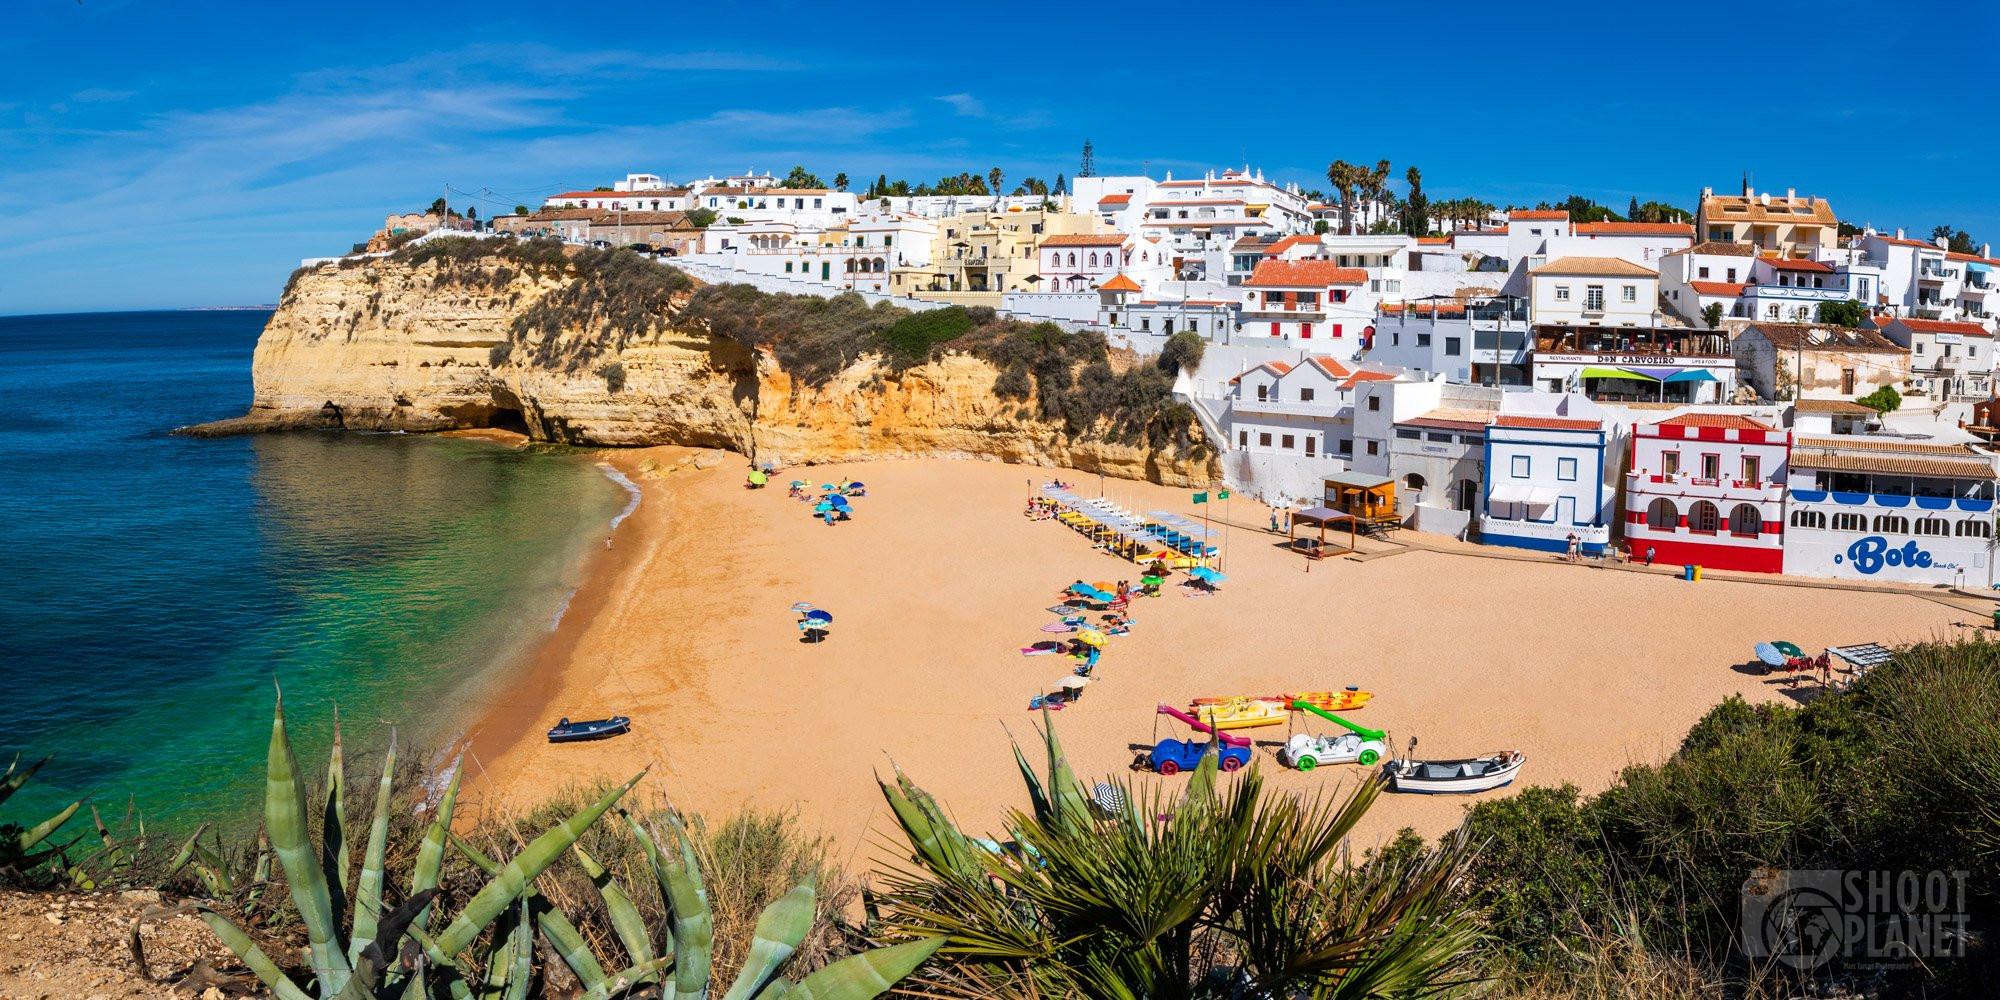 Carvoeiro village, beach, and cliffs, Algarve Portugal